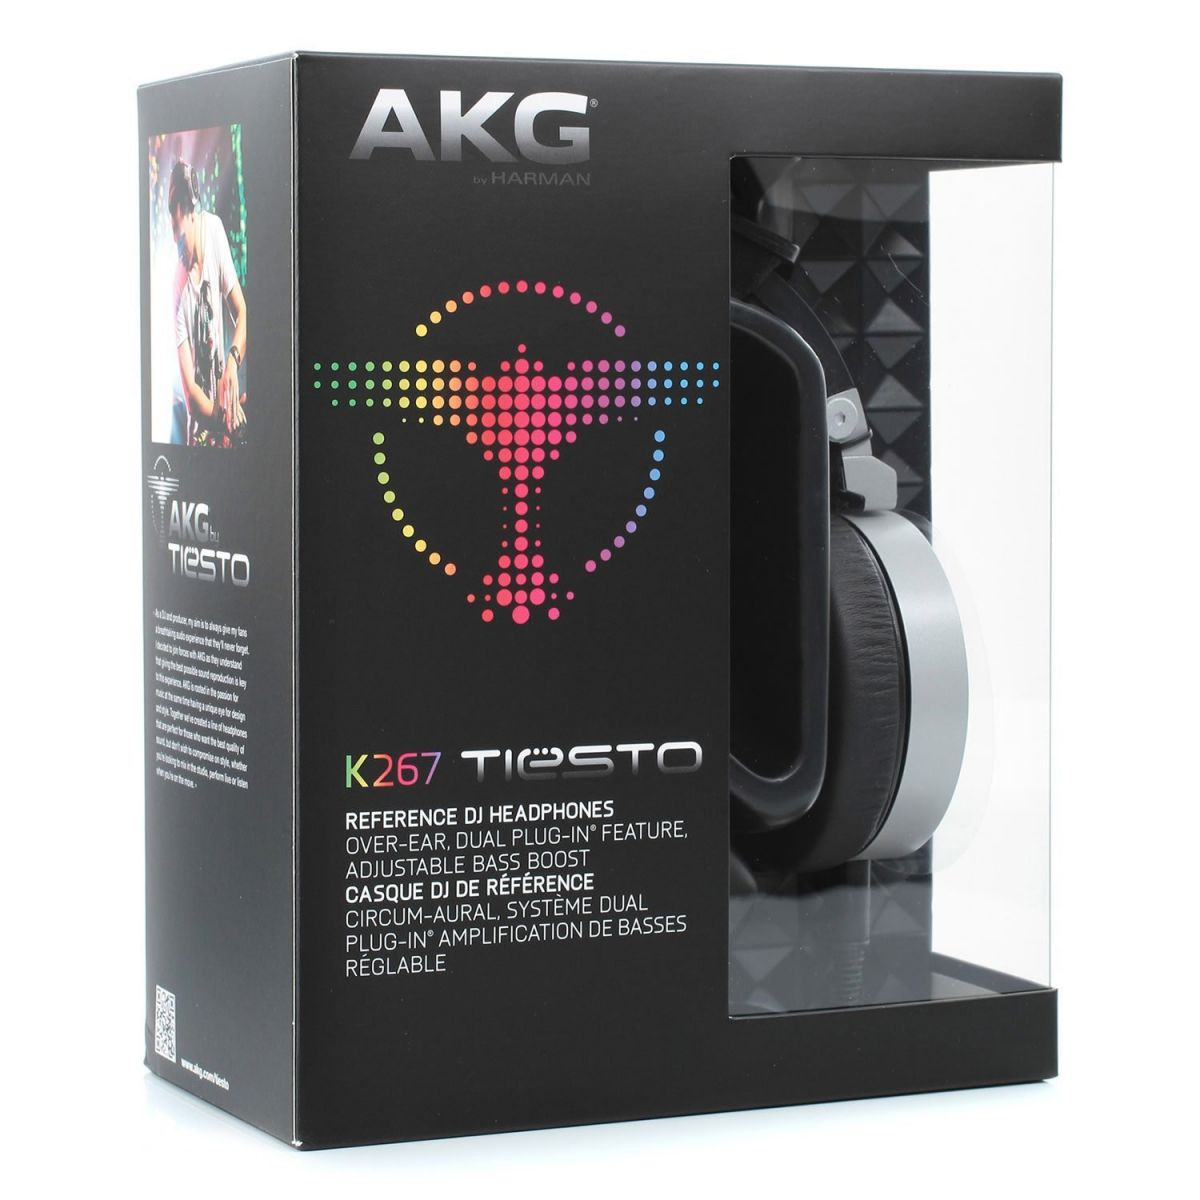 Akg K-267 Tiesto Fone de Ouvido